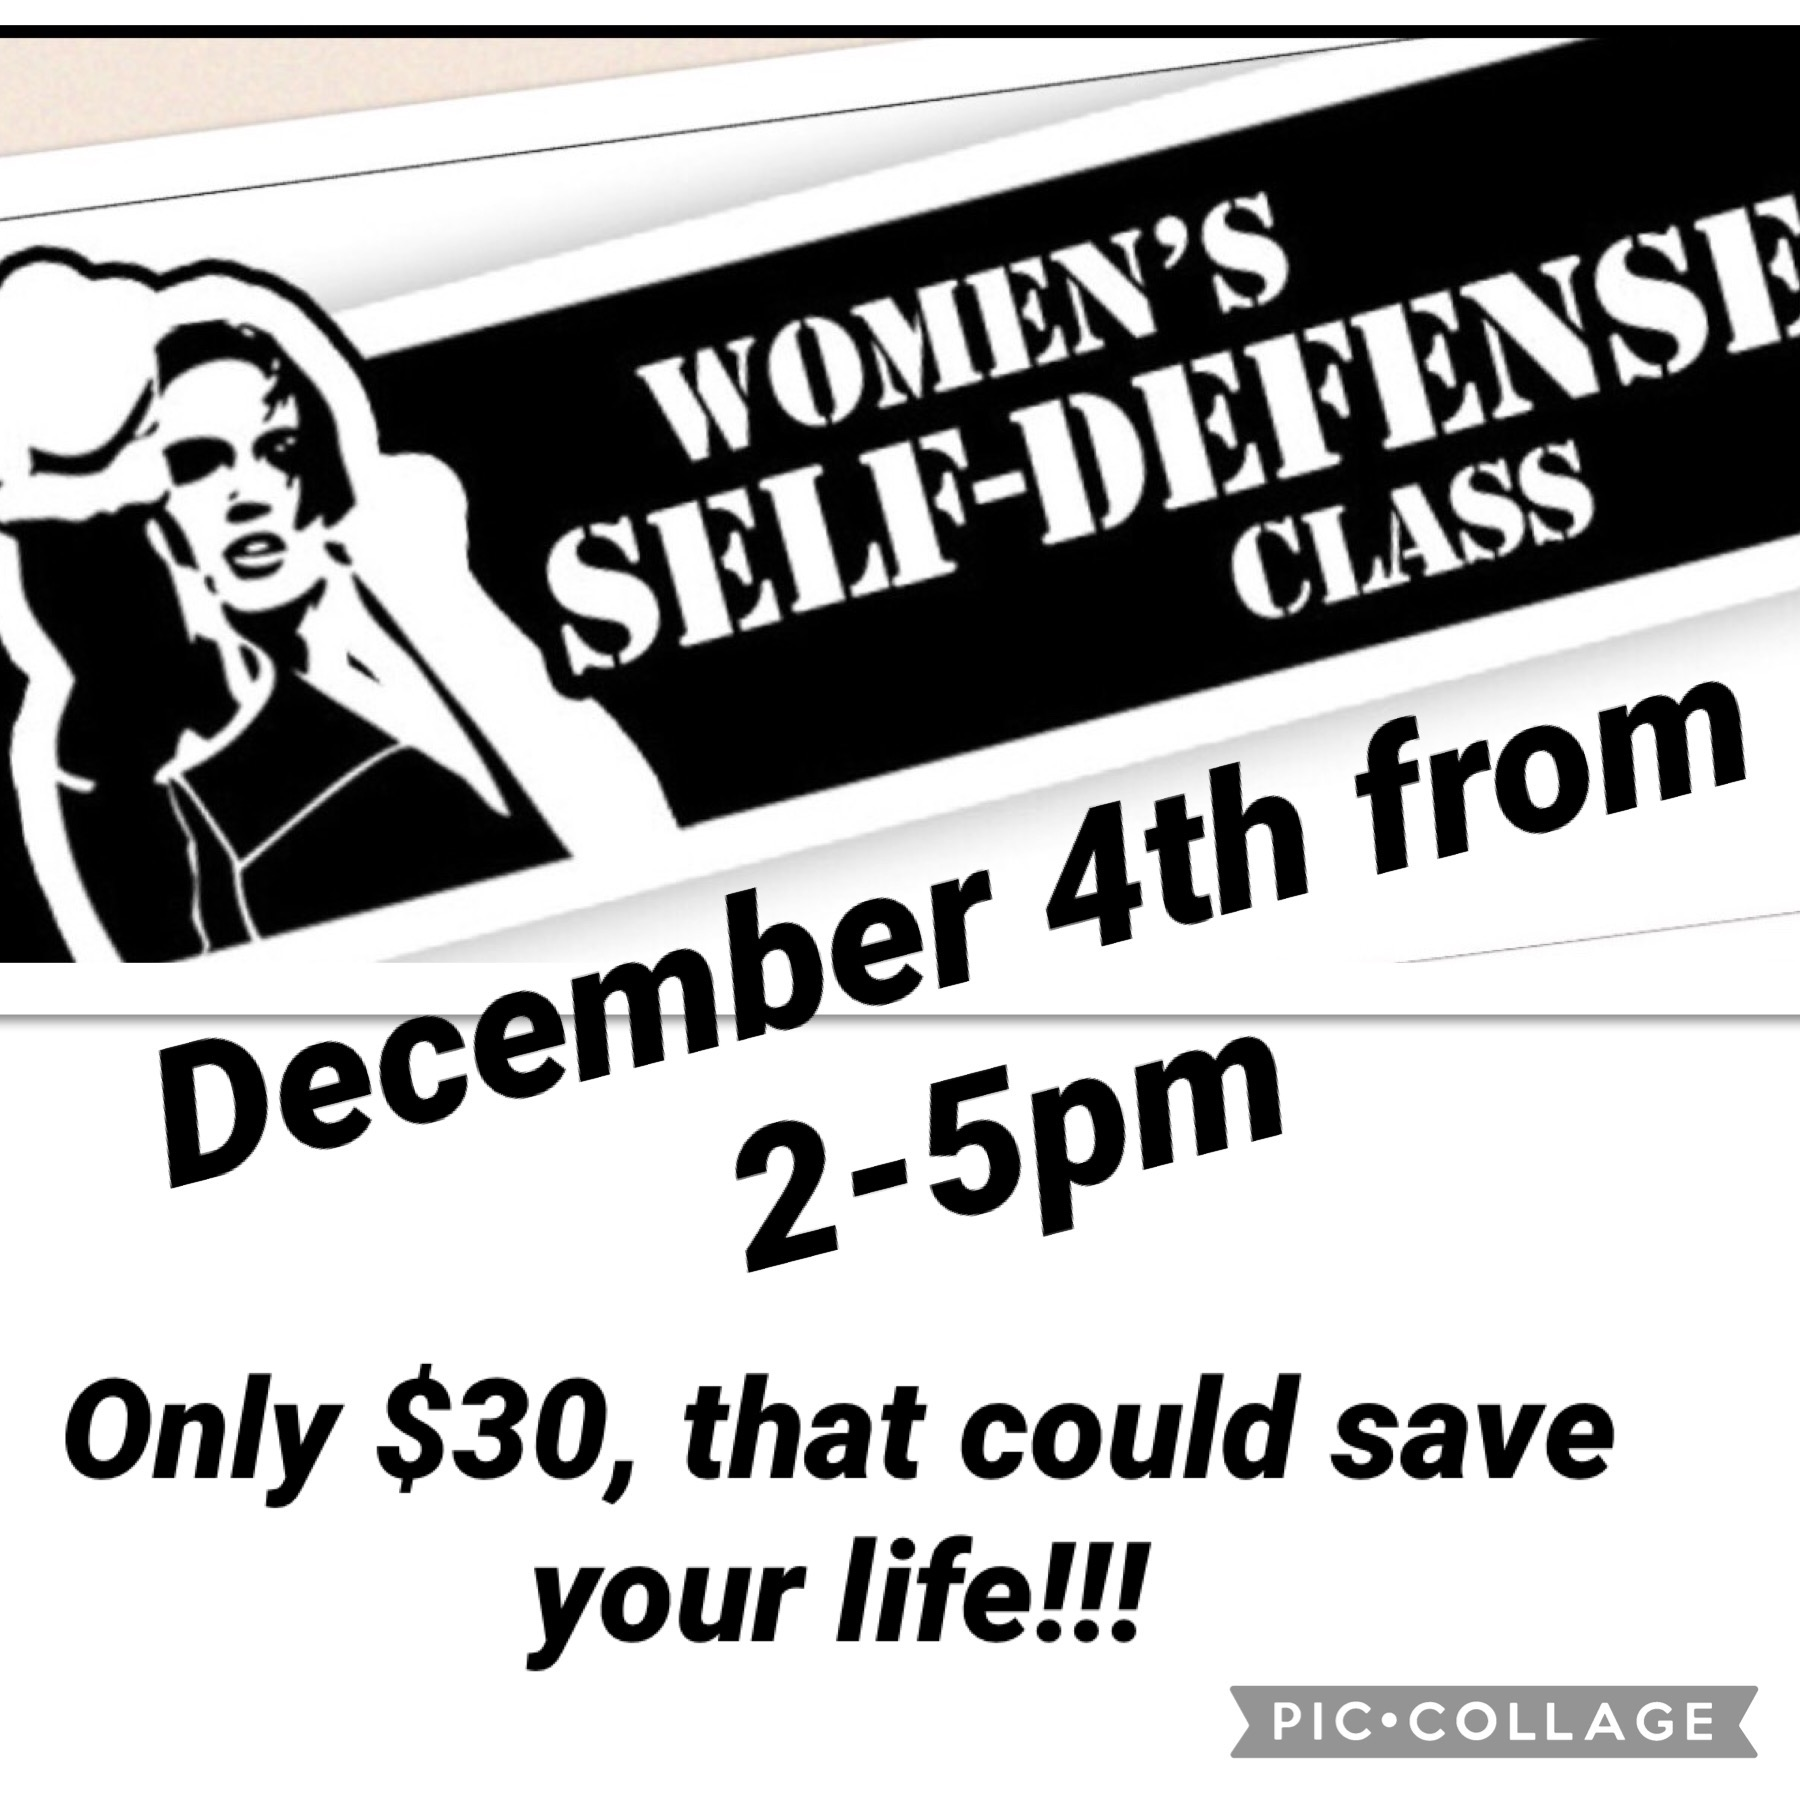 Women's Only Self Defense Workshop